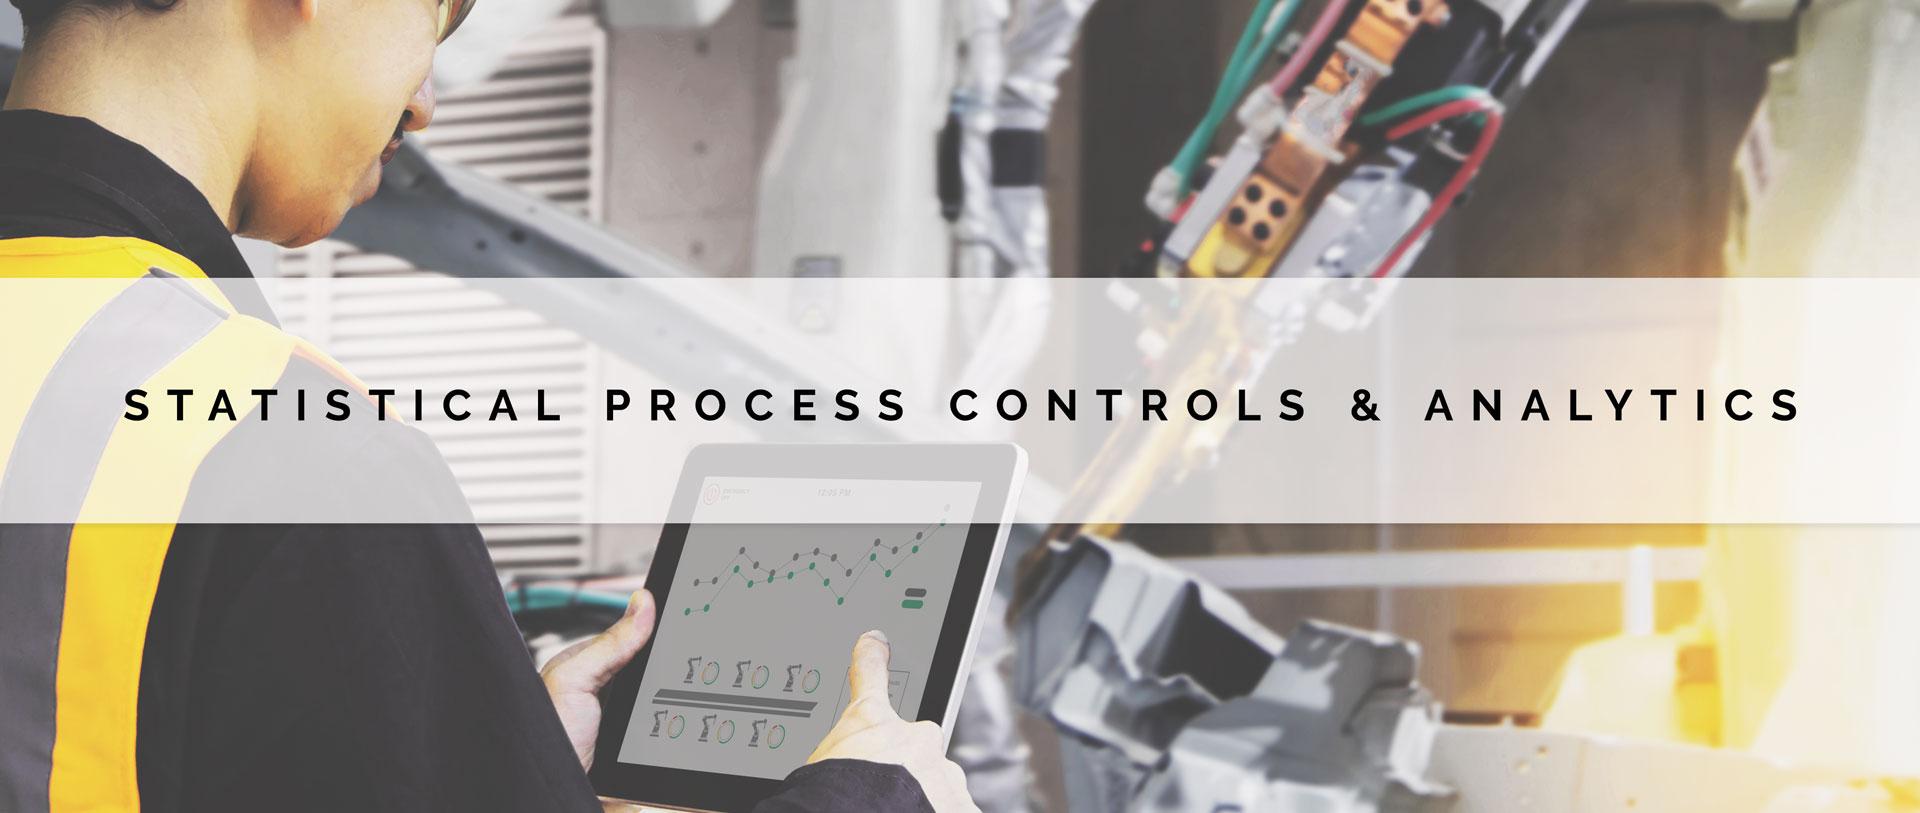 Statistical-Process-Controls-Analytics-Header